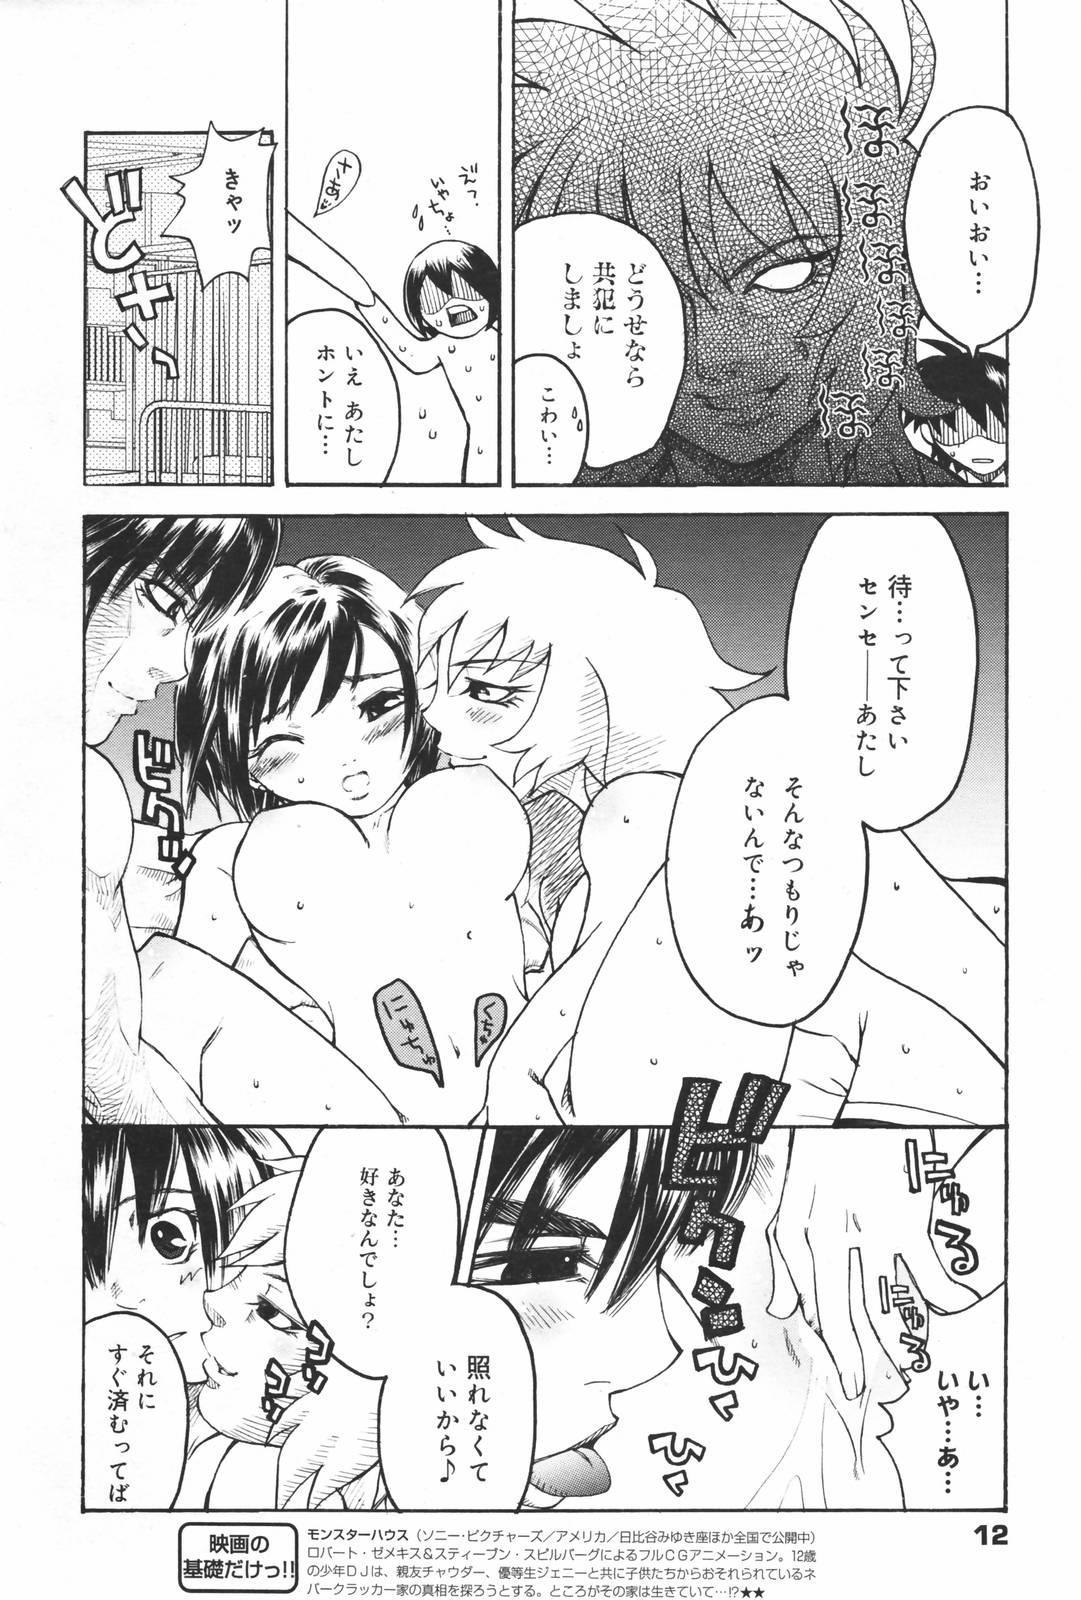 Manga Bangaichi 2007-03 11